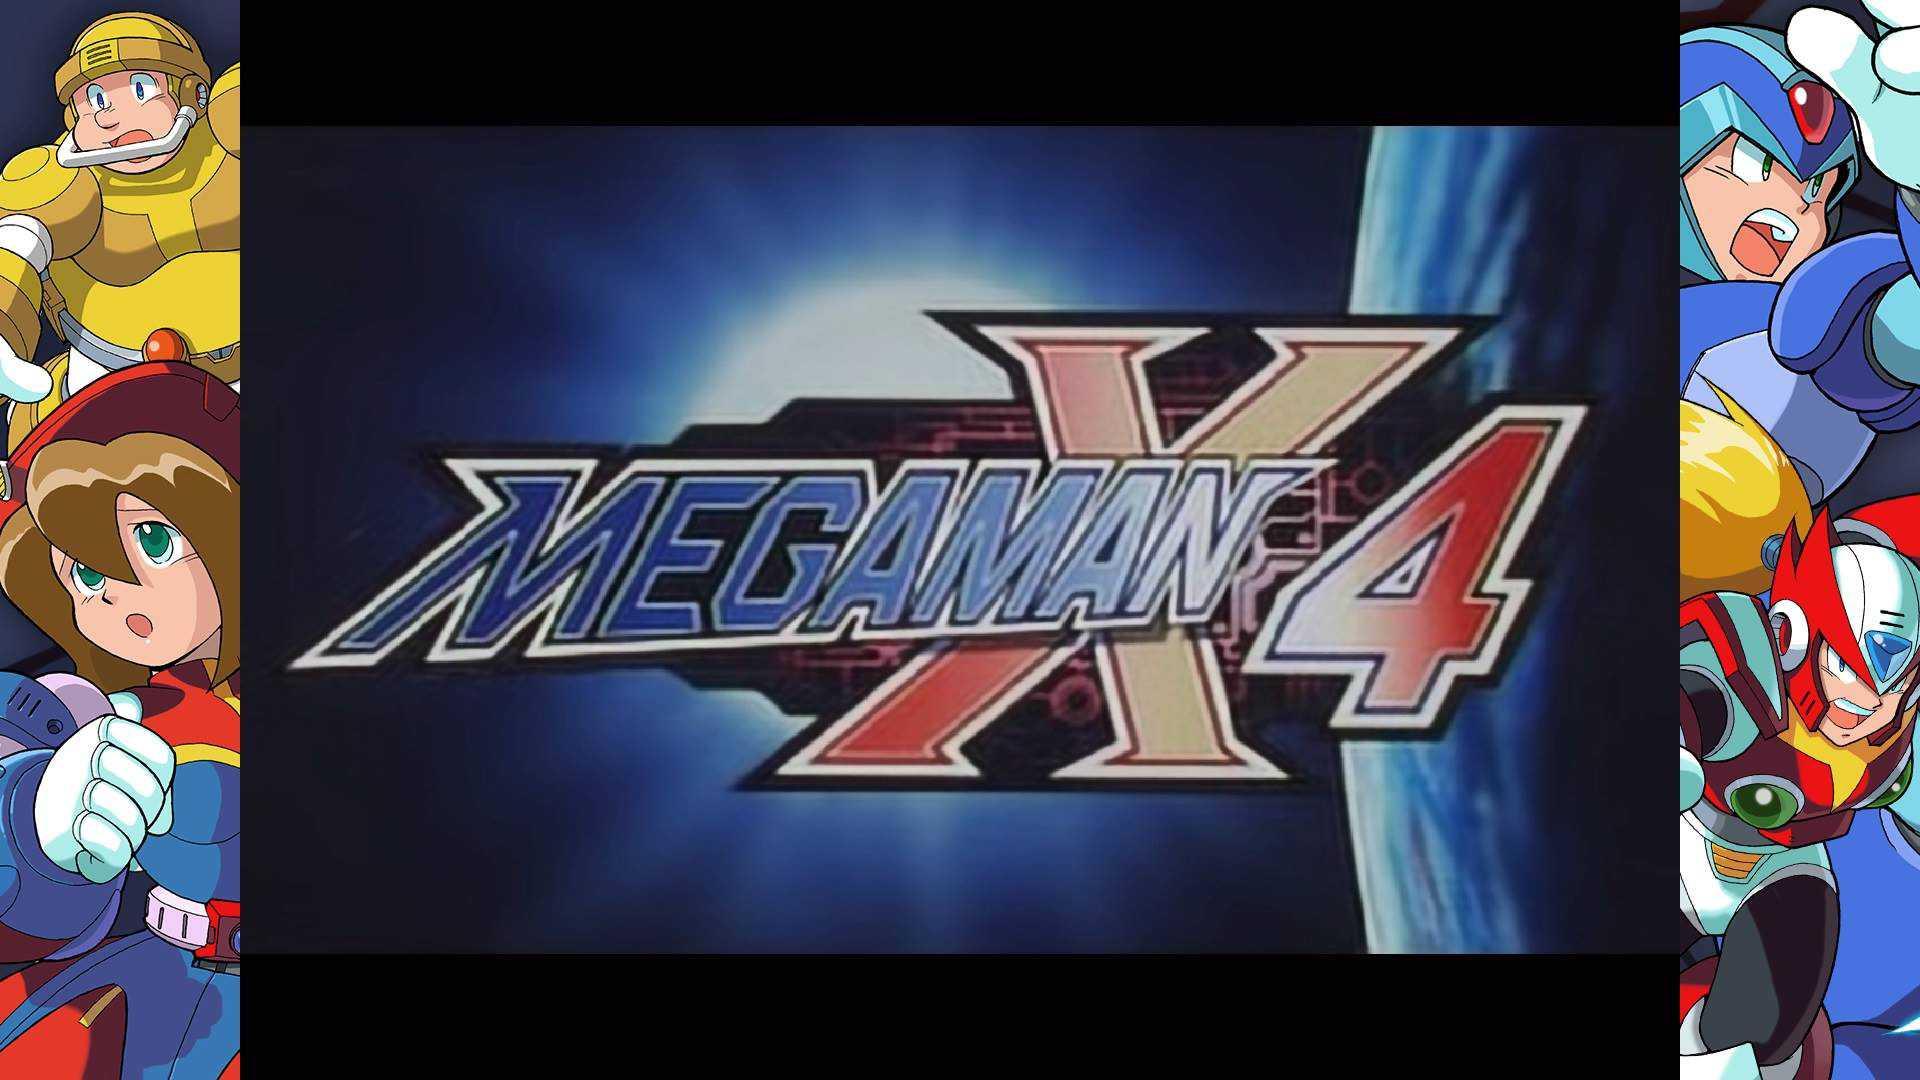 Mega Man X4 was released for multiple platforms in 1997.